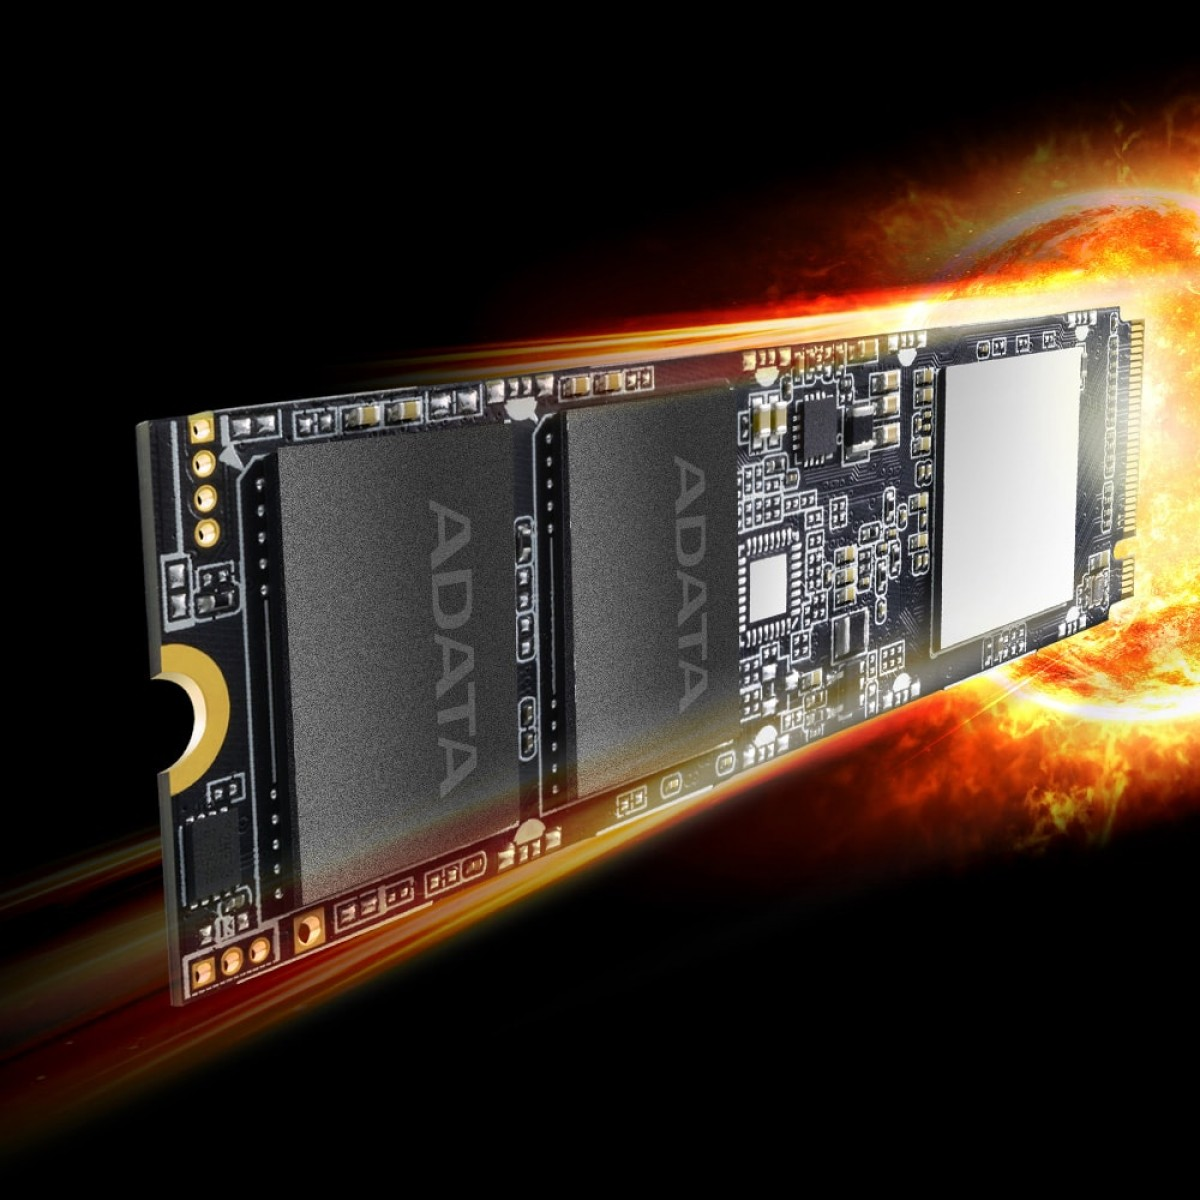 SSD Adata XPG SX8100 512GB, M.2 2280, Leitura 3500MBs e Gravação 3000MBs, ASX8100NP-512GT-C